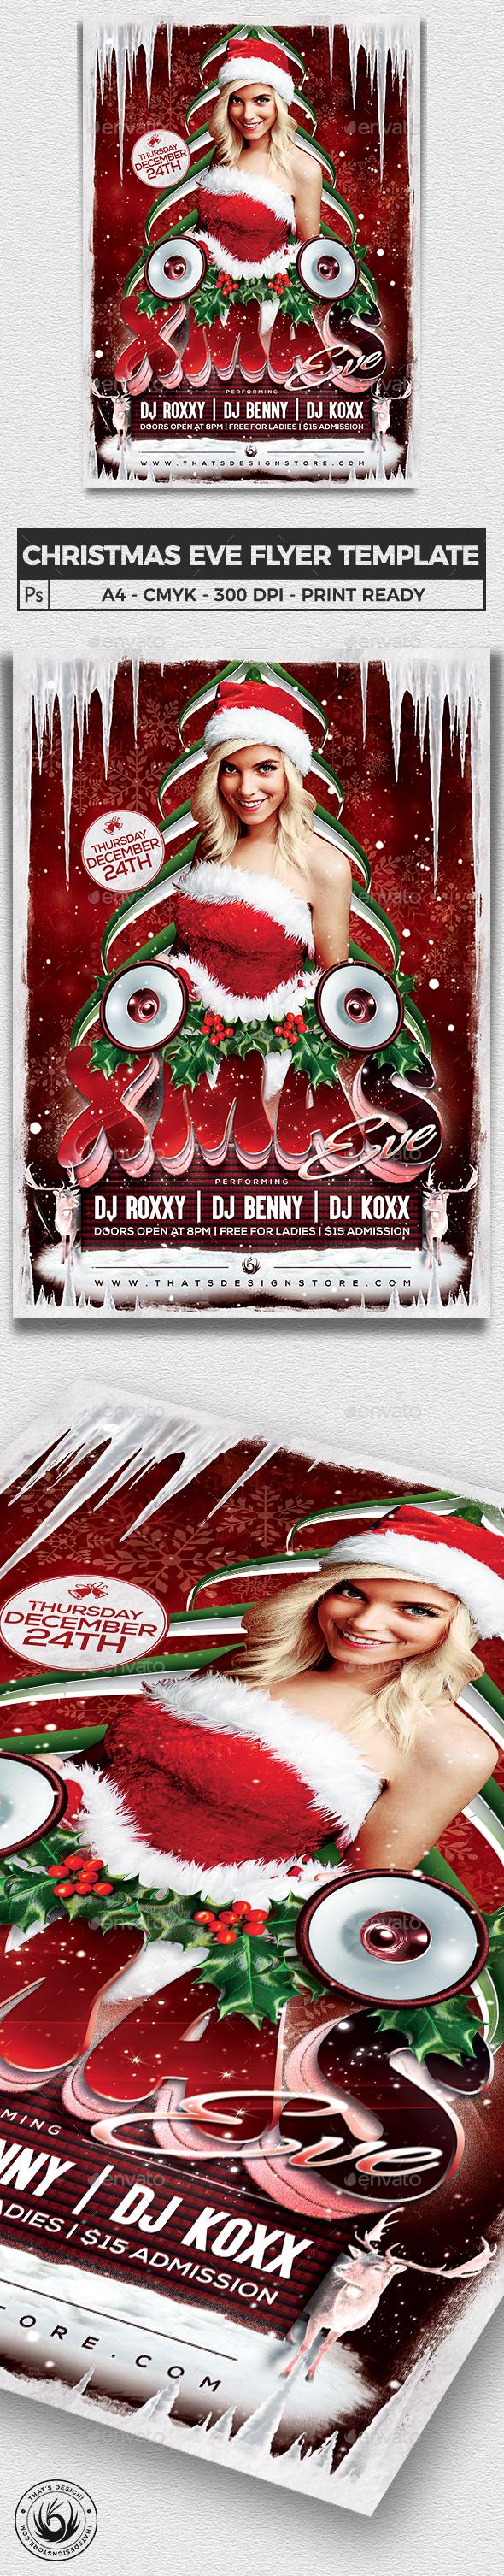 Christmas Eve Flyer Template V1 - Holidays Events